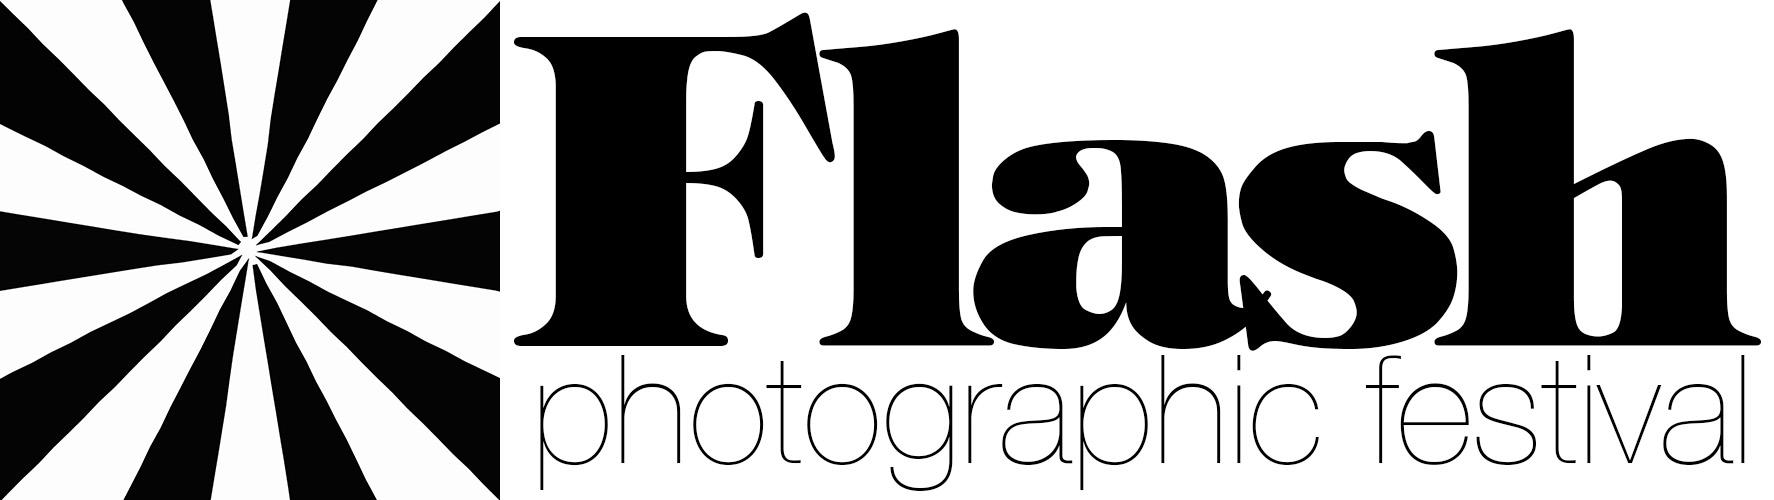 flash-photo-logo-website-april-2015